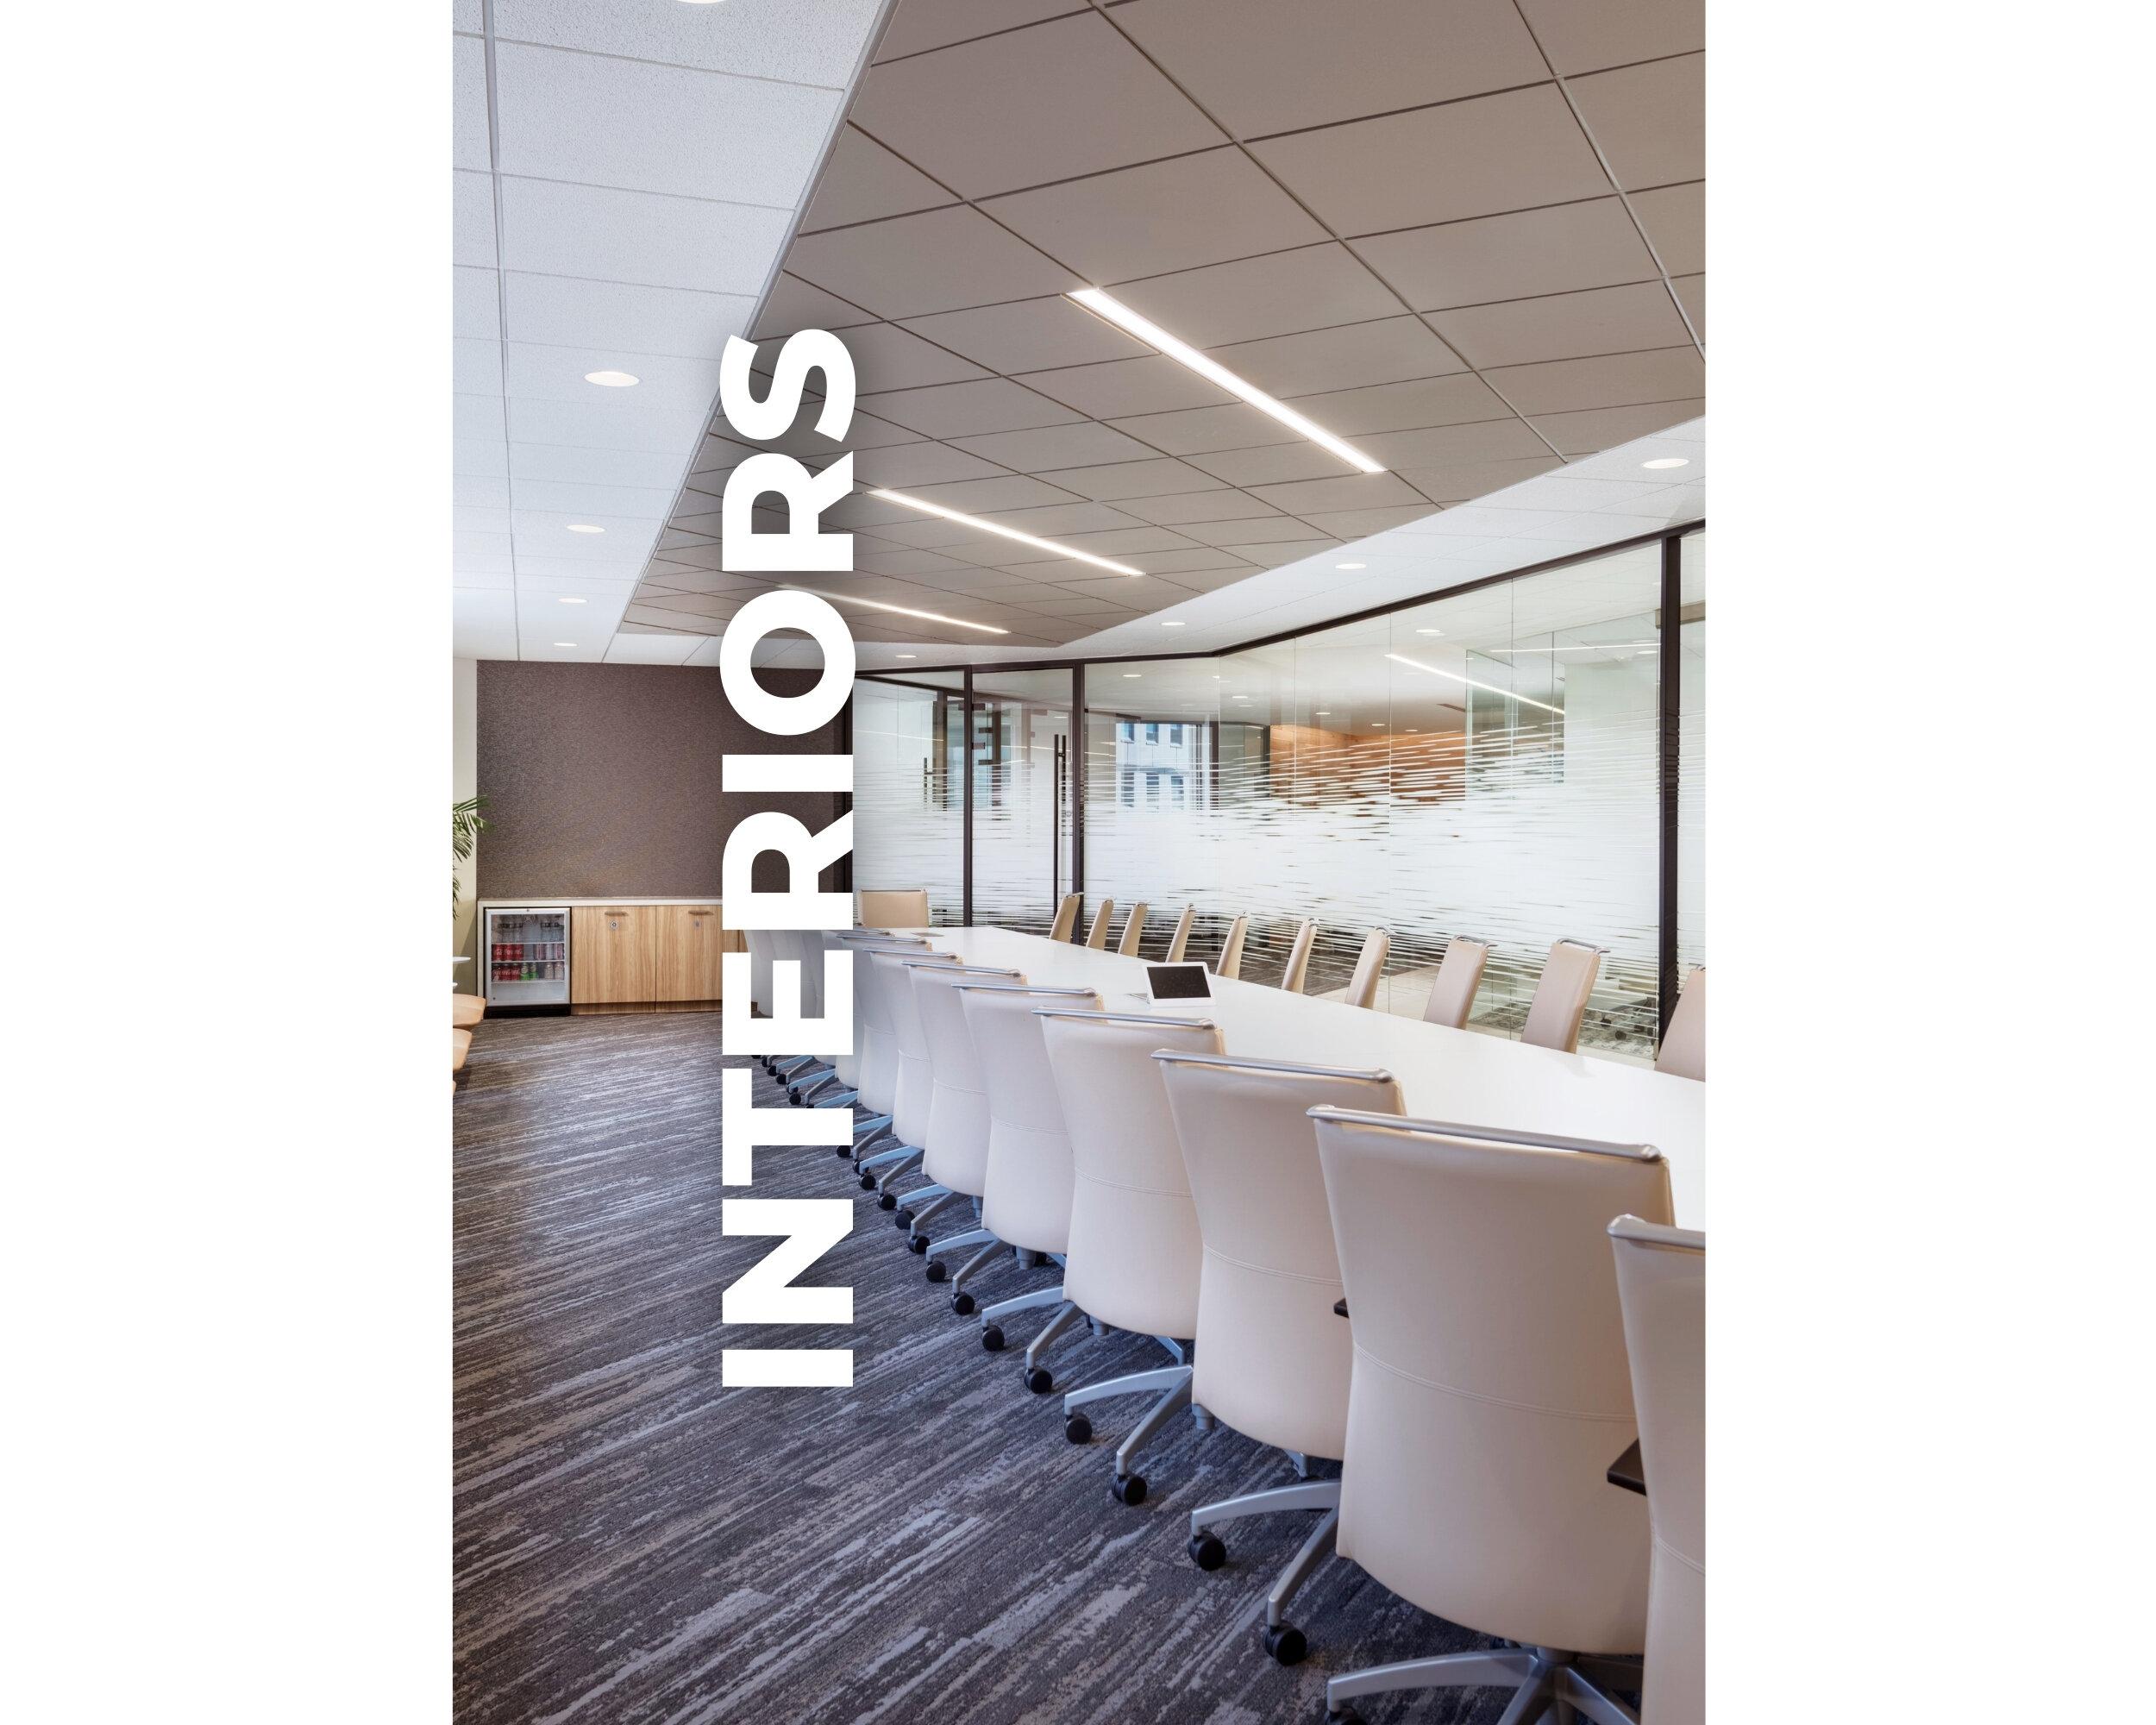 <p><strong>Interiors Portfolio</strong></p>